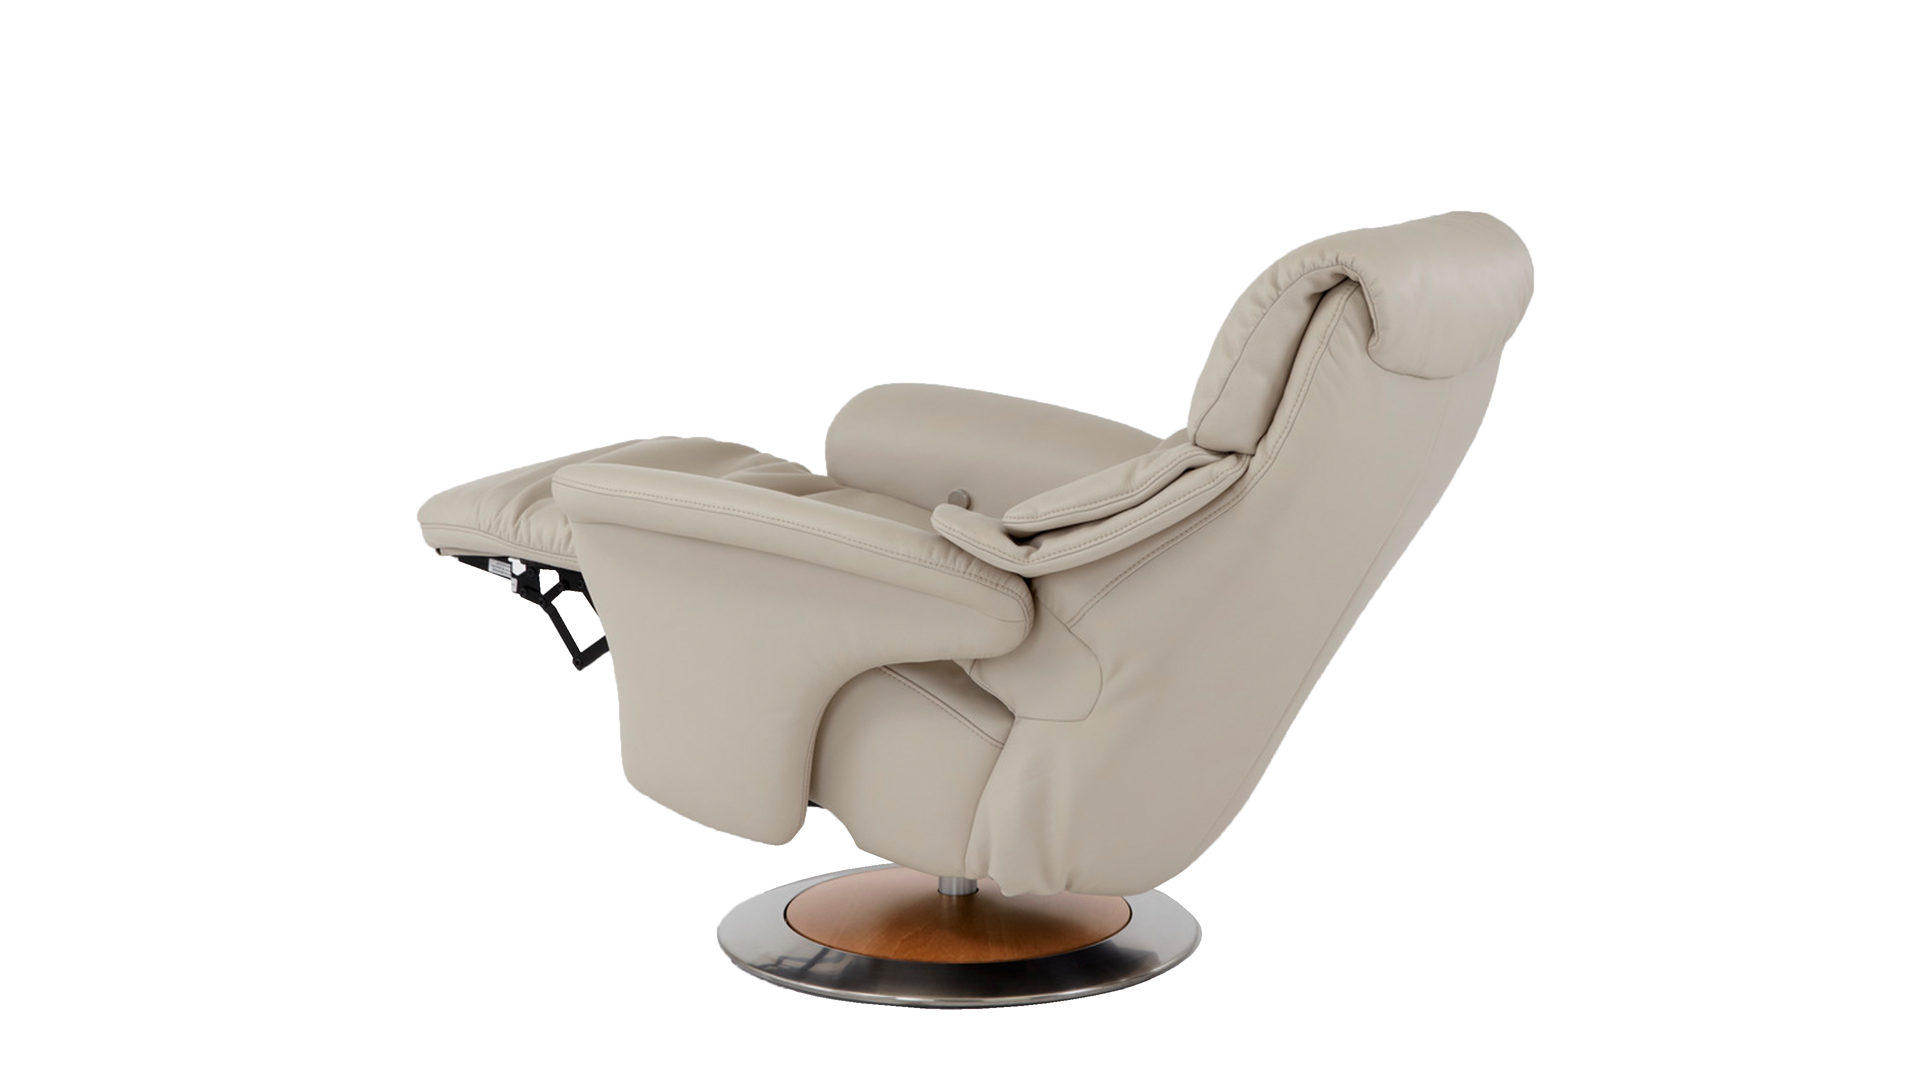 Relaxsessel Beige Leder. Top Relaxsessel Leder Loumea Beige With ...